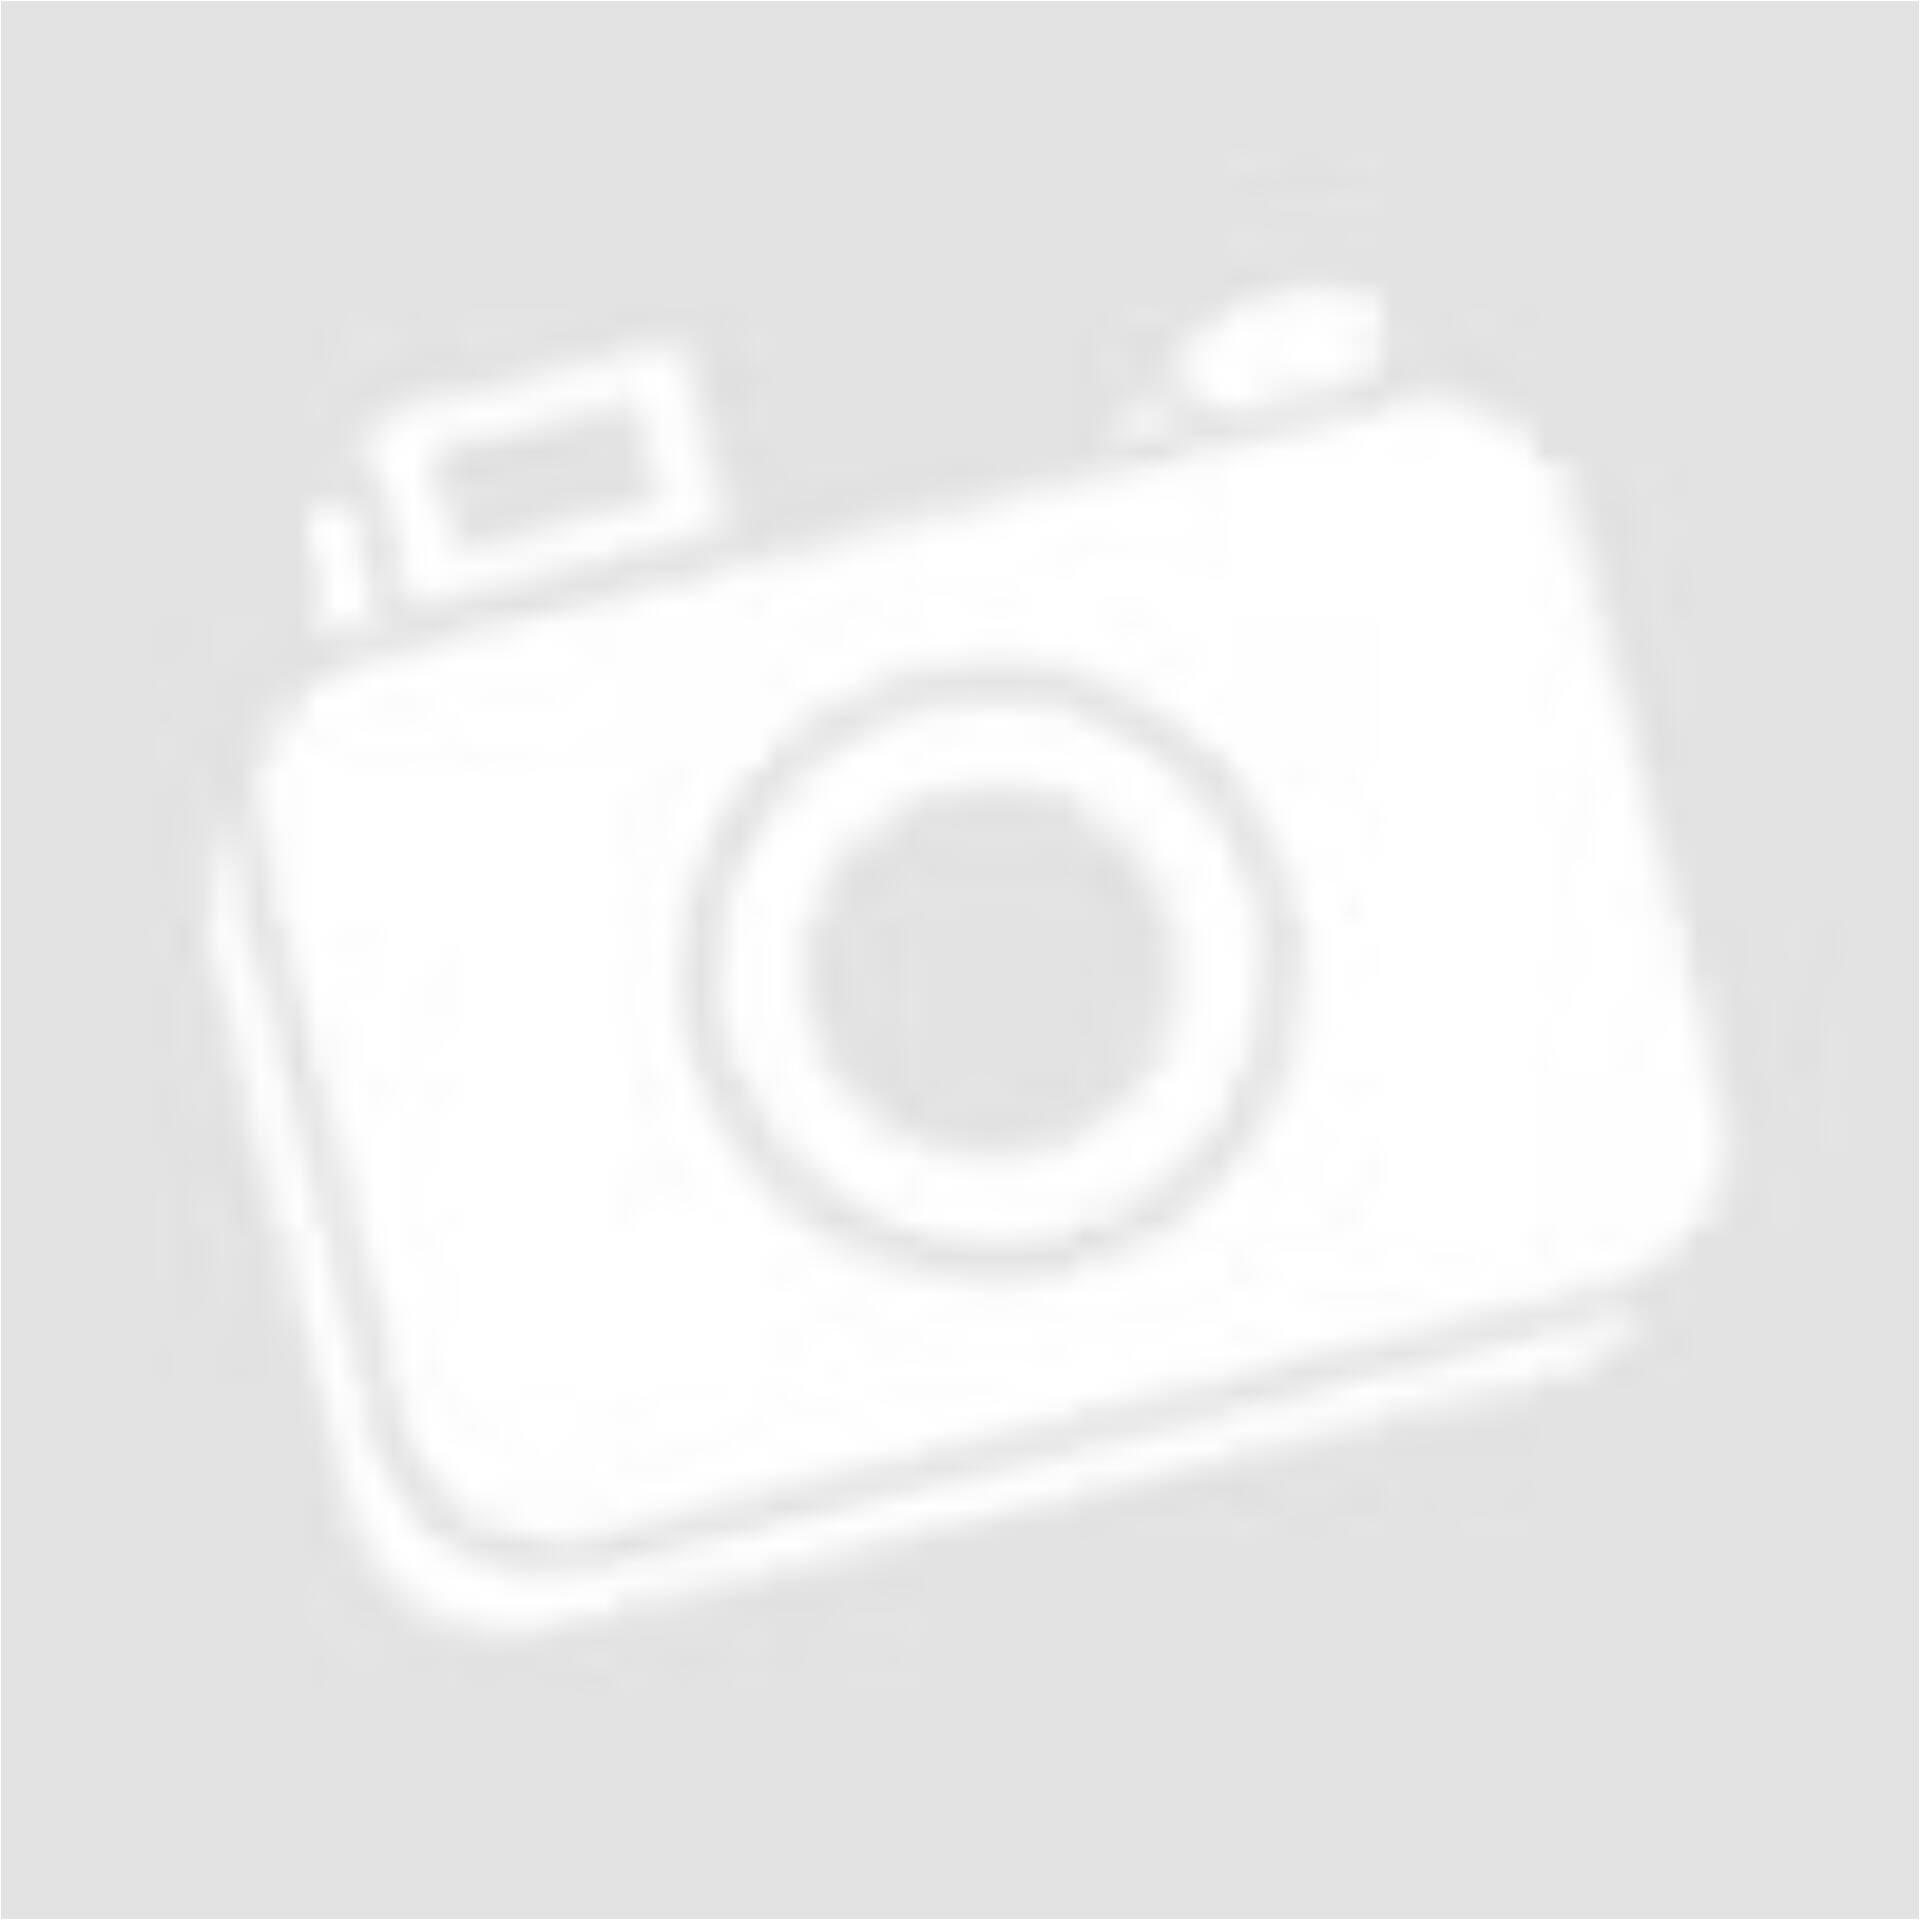 c5c03330e7 NIKE MERCURIAL DAVID sportcipő (Méret: 38) - Edzőcipő - Öltözz ki ...